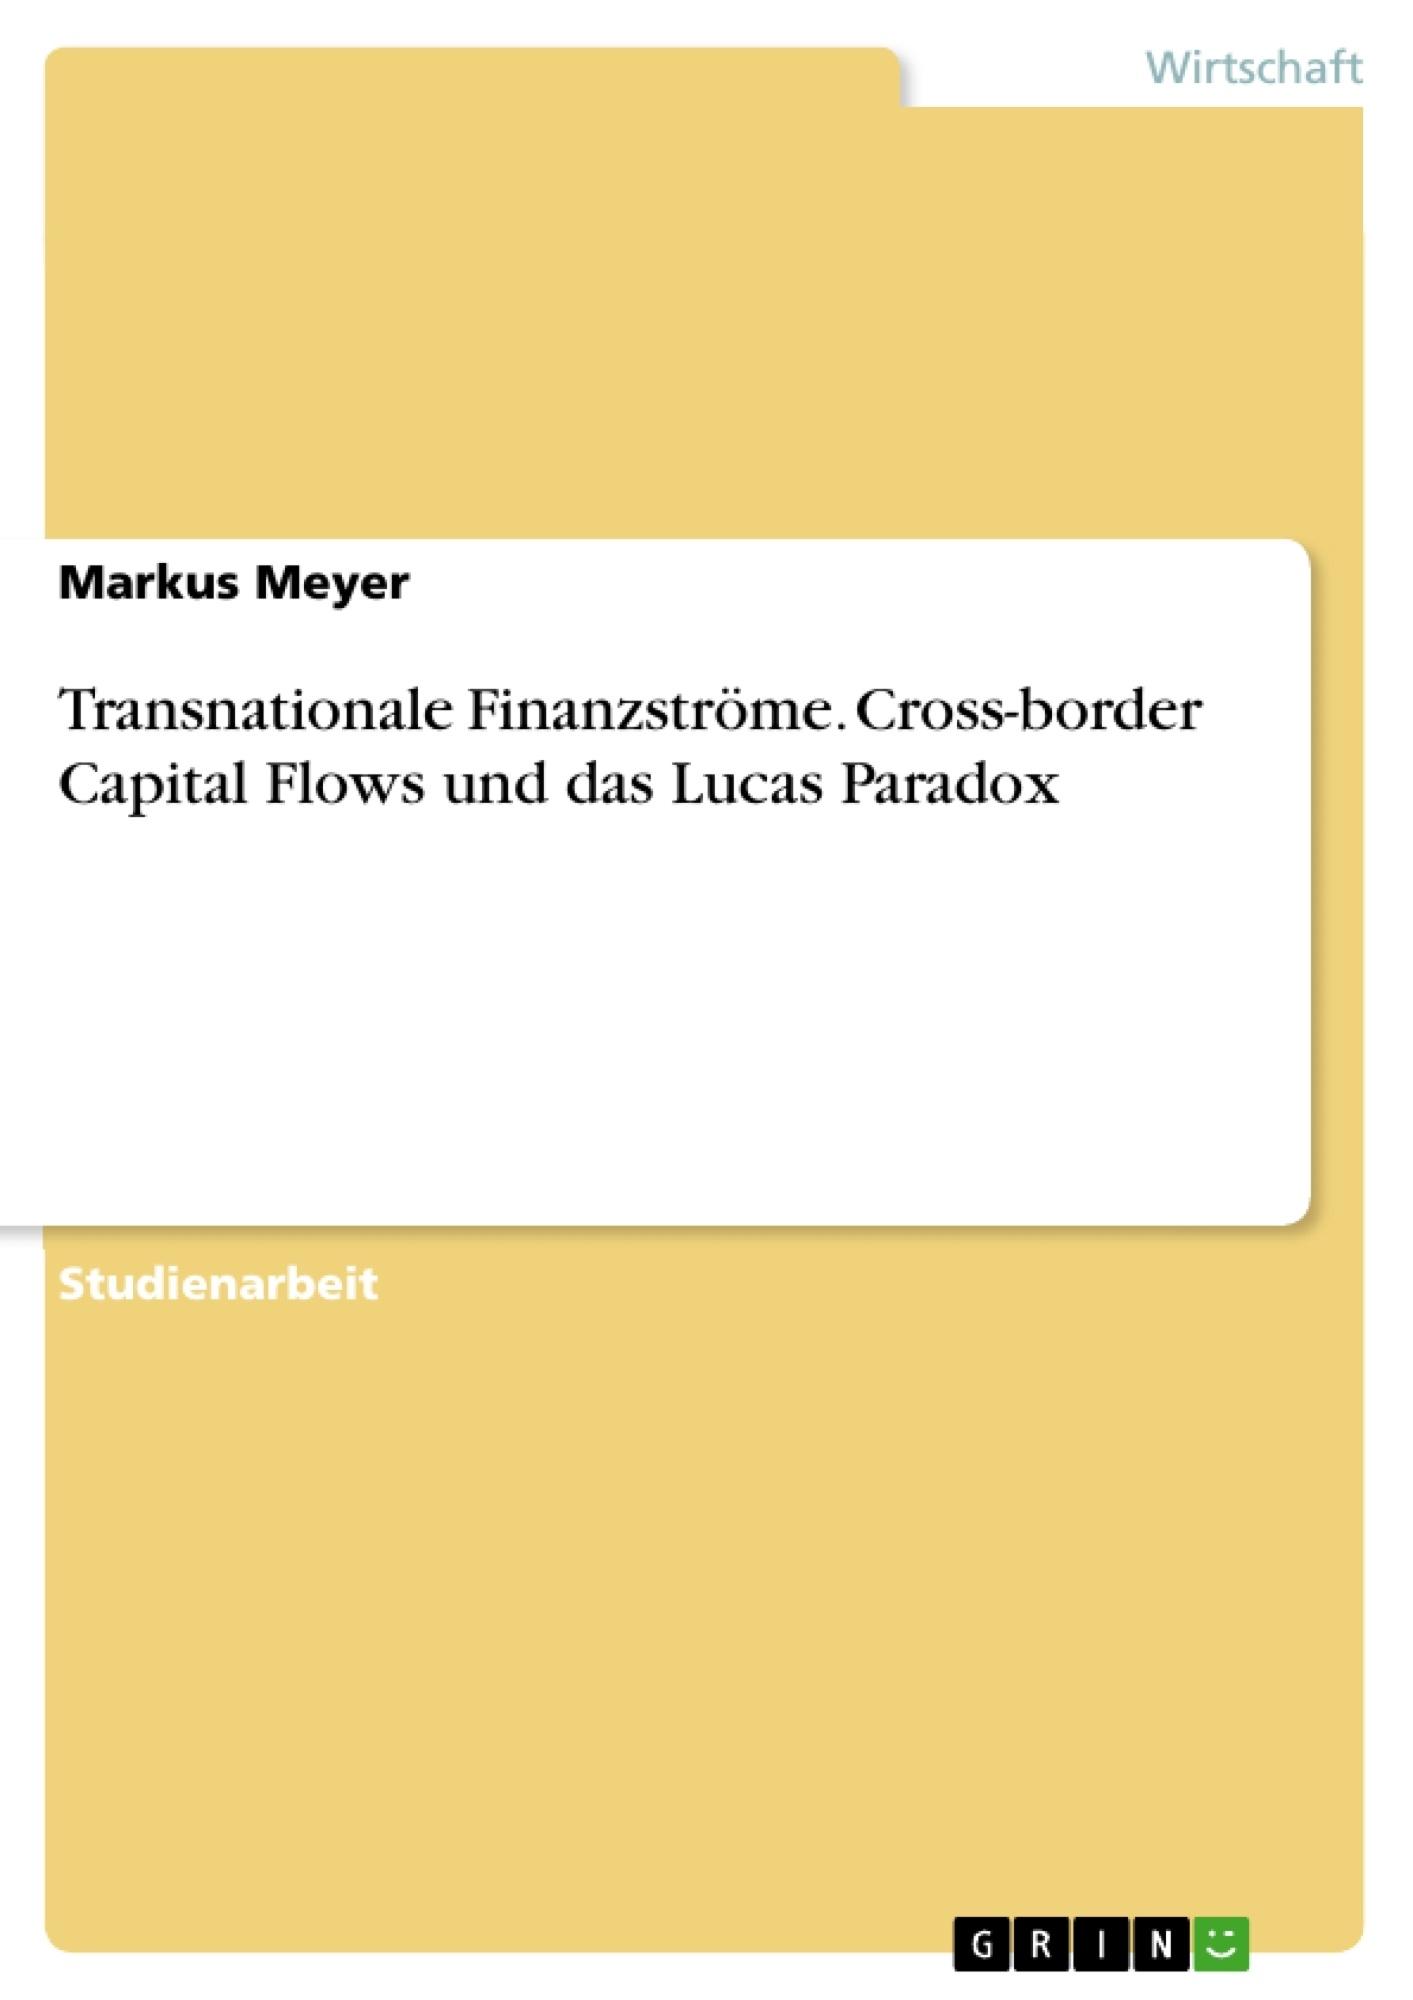 Titel: Transnationale Finanzströme. Cross-border Capital Flows und das Lucas Paradox